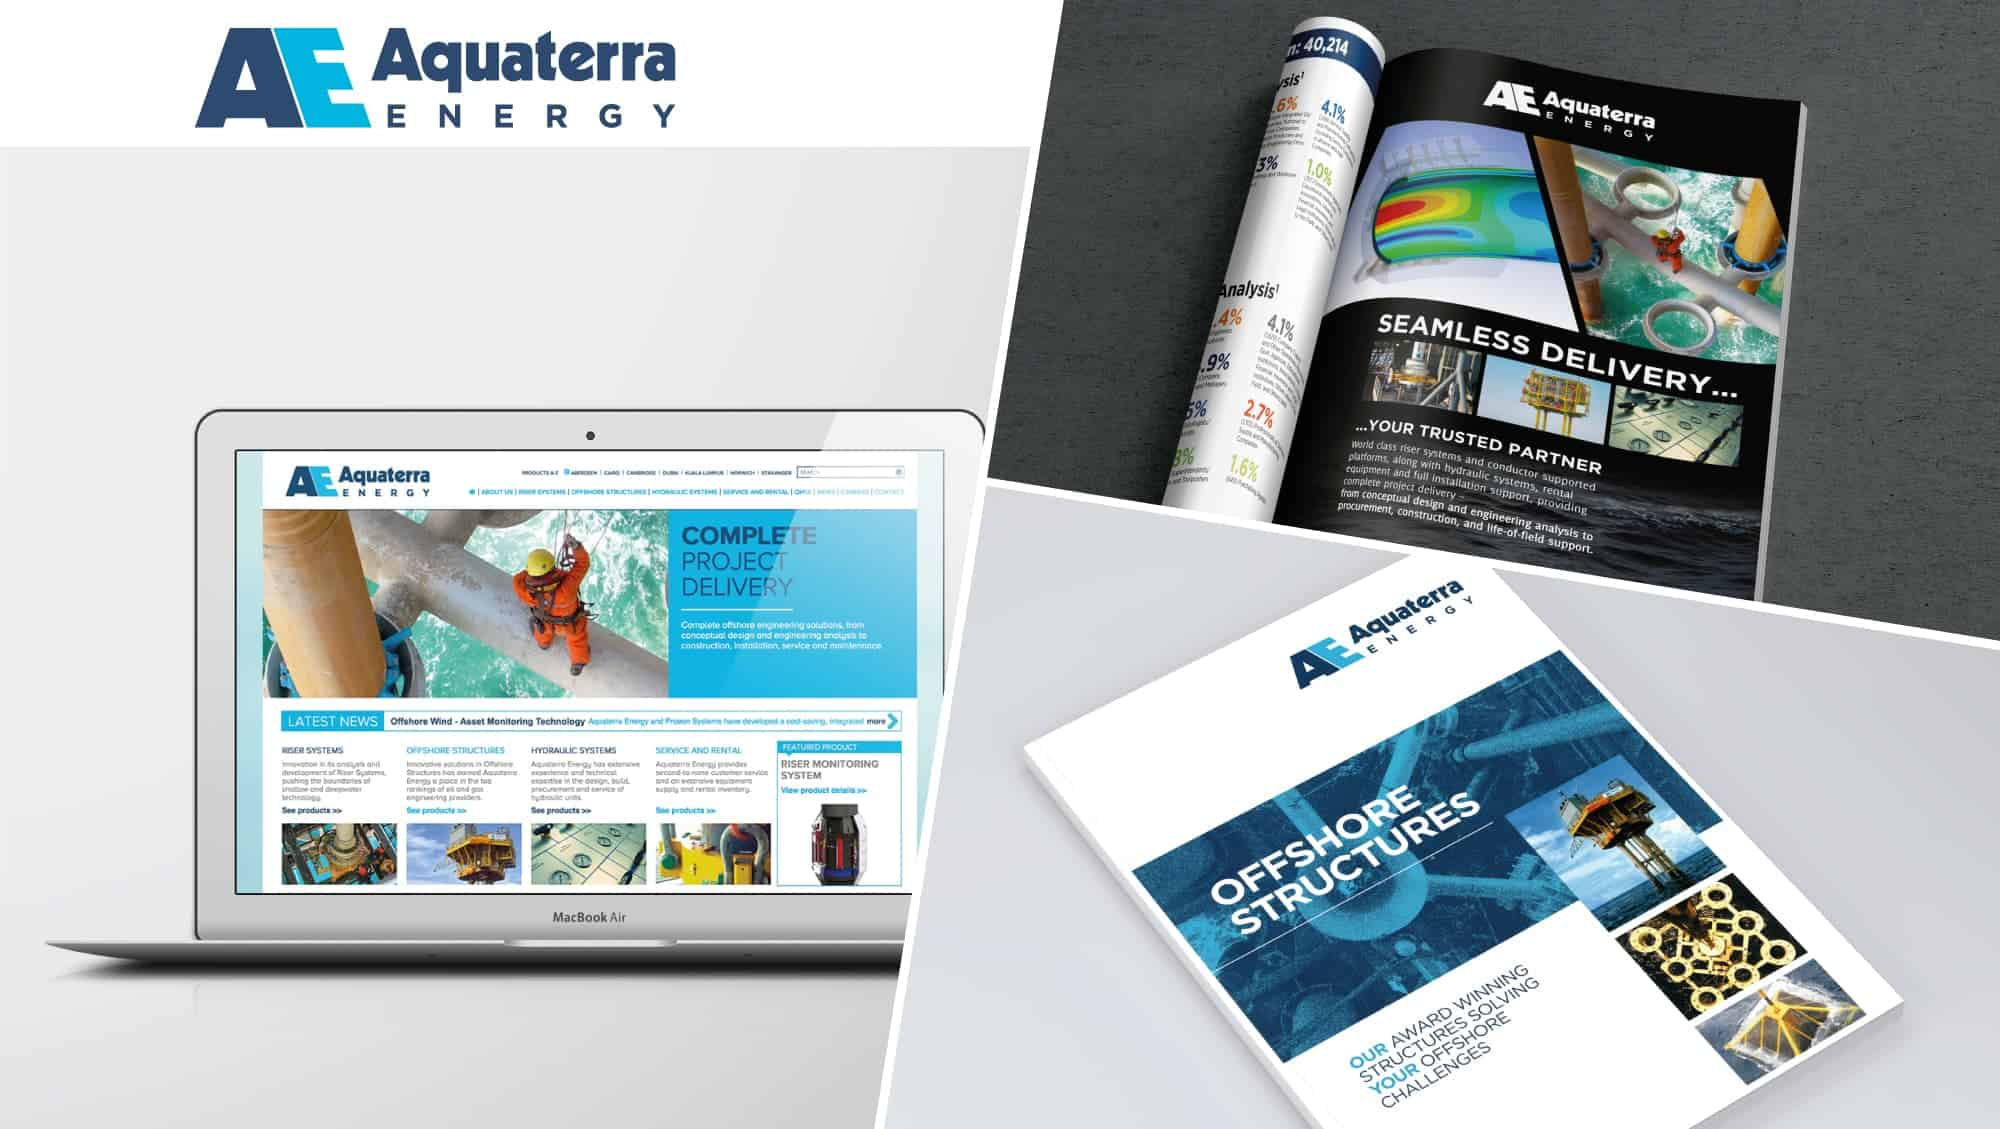 Aquaterra energy case study image